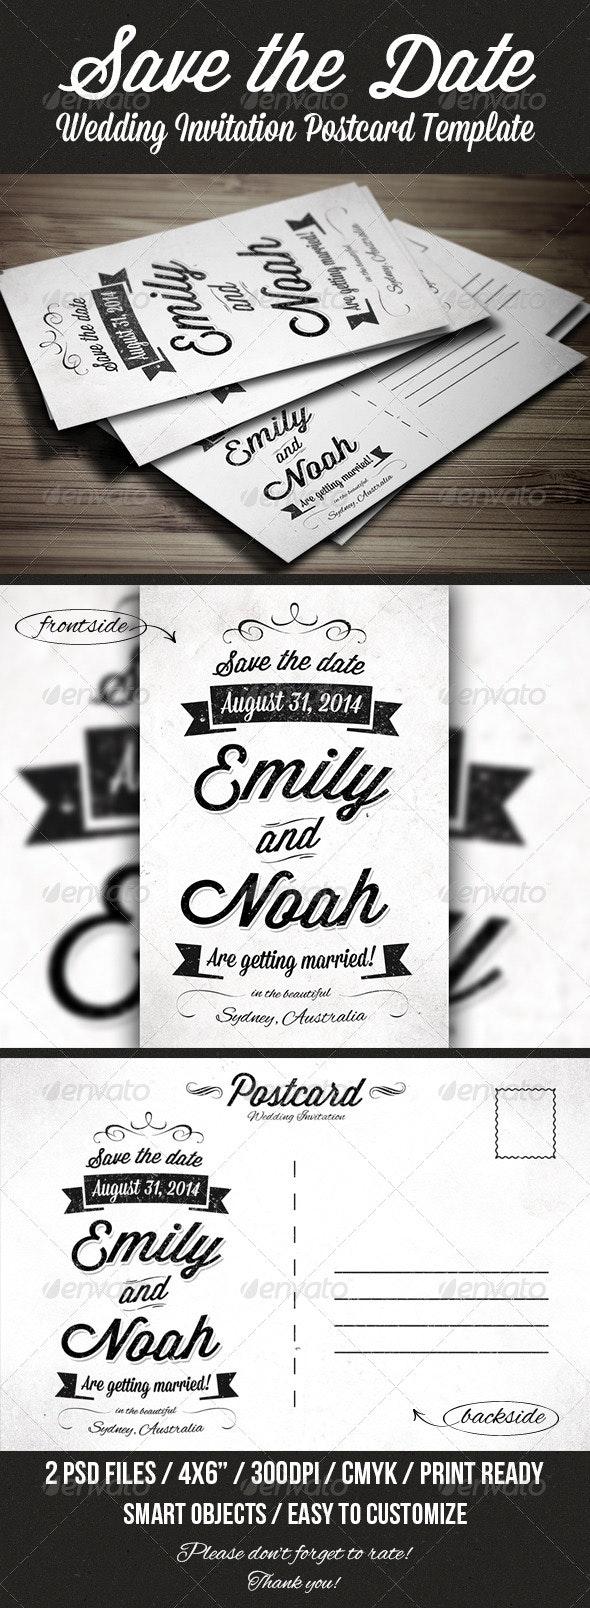 Save the Date Invitation Postcard - Weddings Cards & Invites